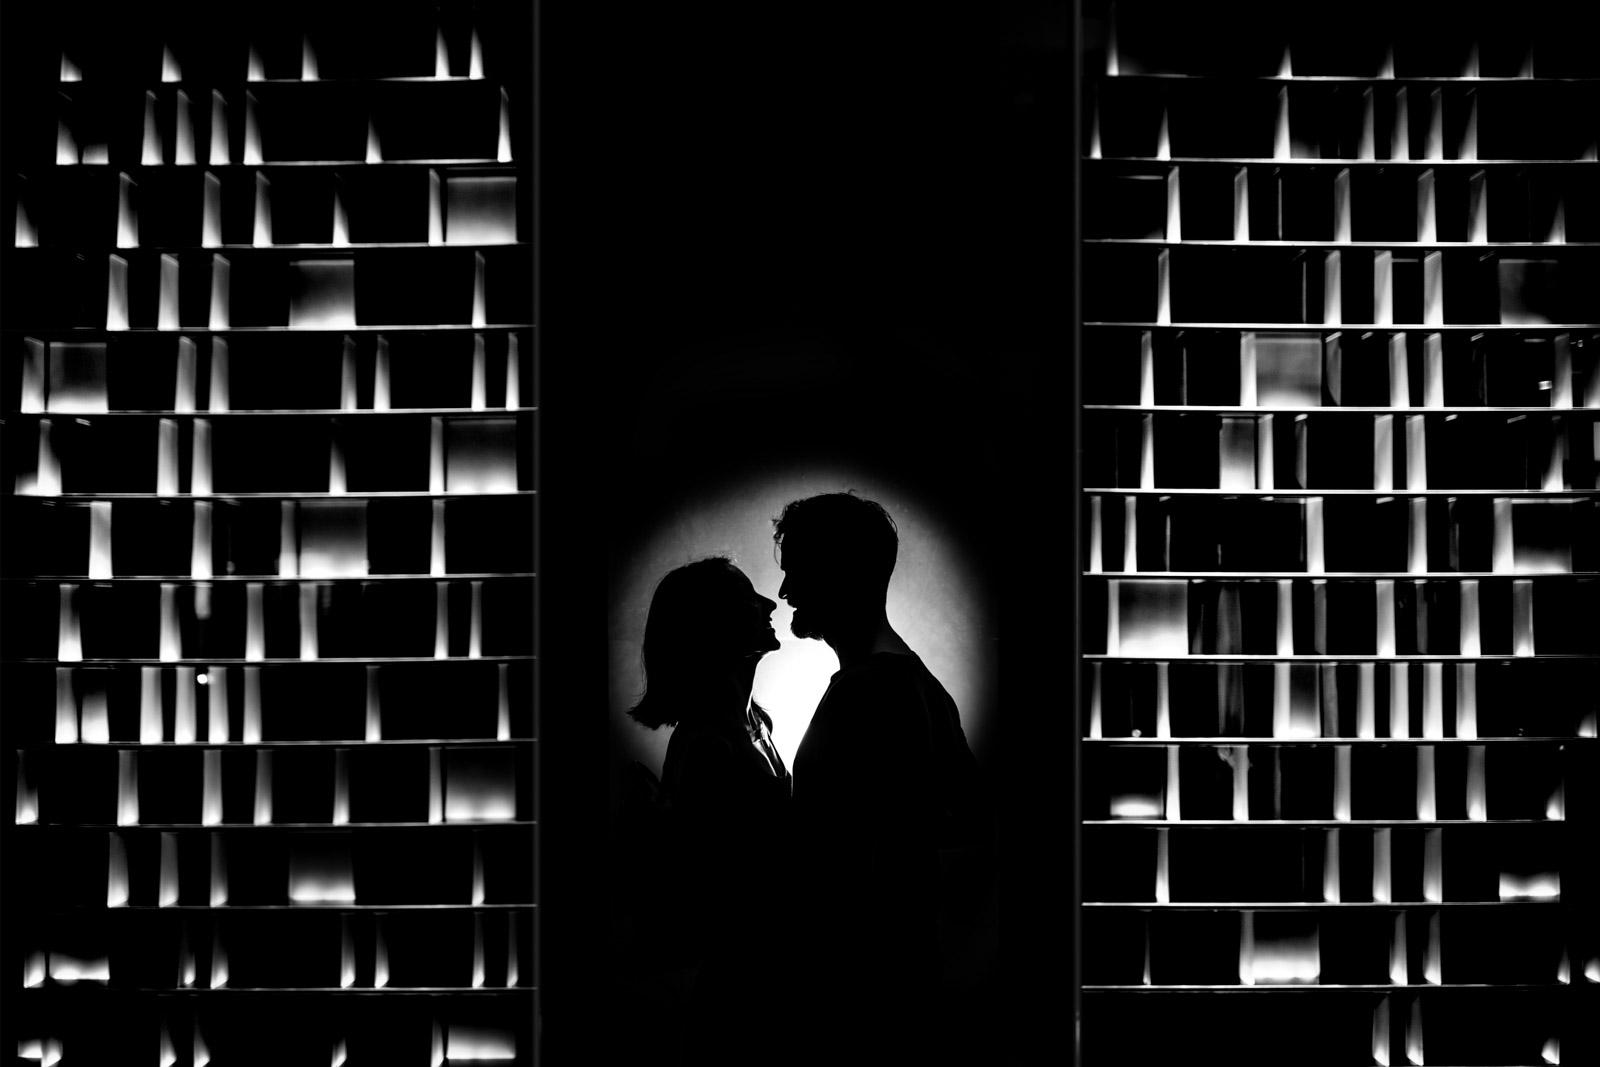 Sedinta foto cuplu Bucuresti- Sedinta foto save the date- sedinta foto love story- Sedinta foto Bucuresti-Fotografi si cameramani